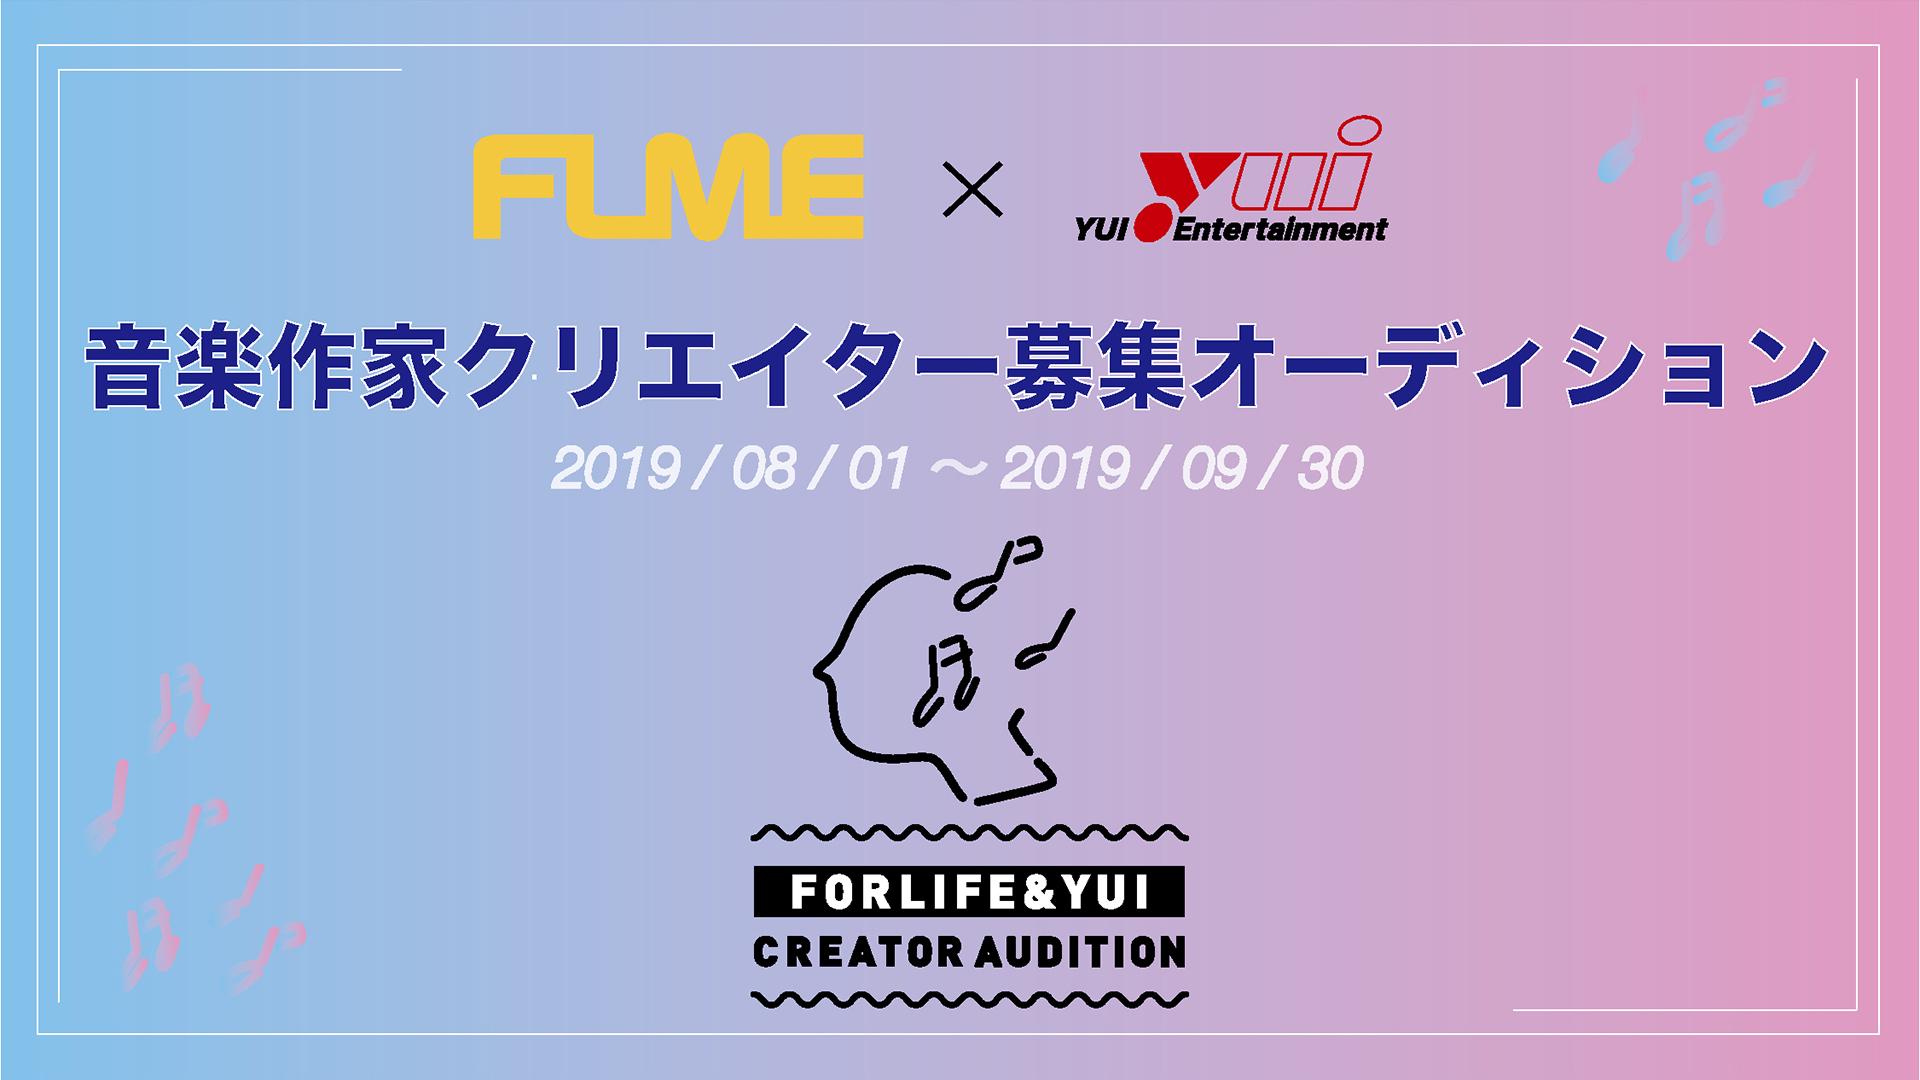 FLME x Yui クリエイターオーディション